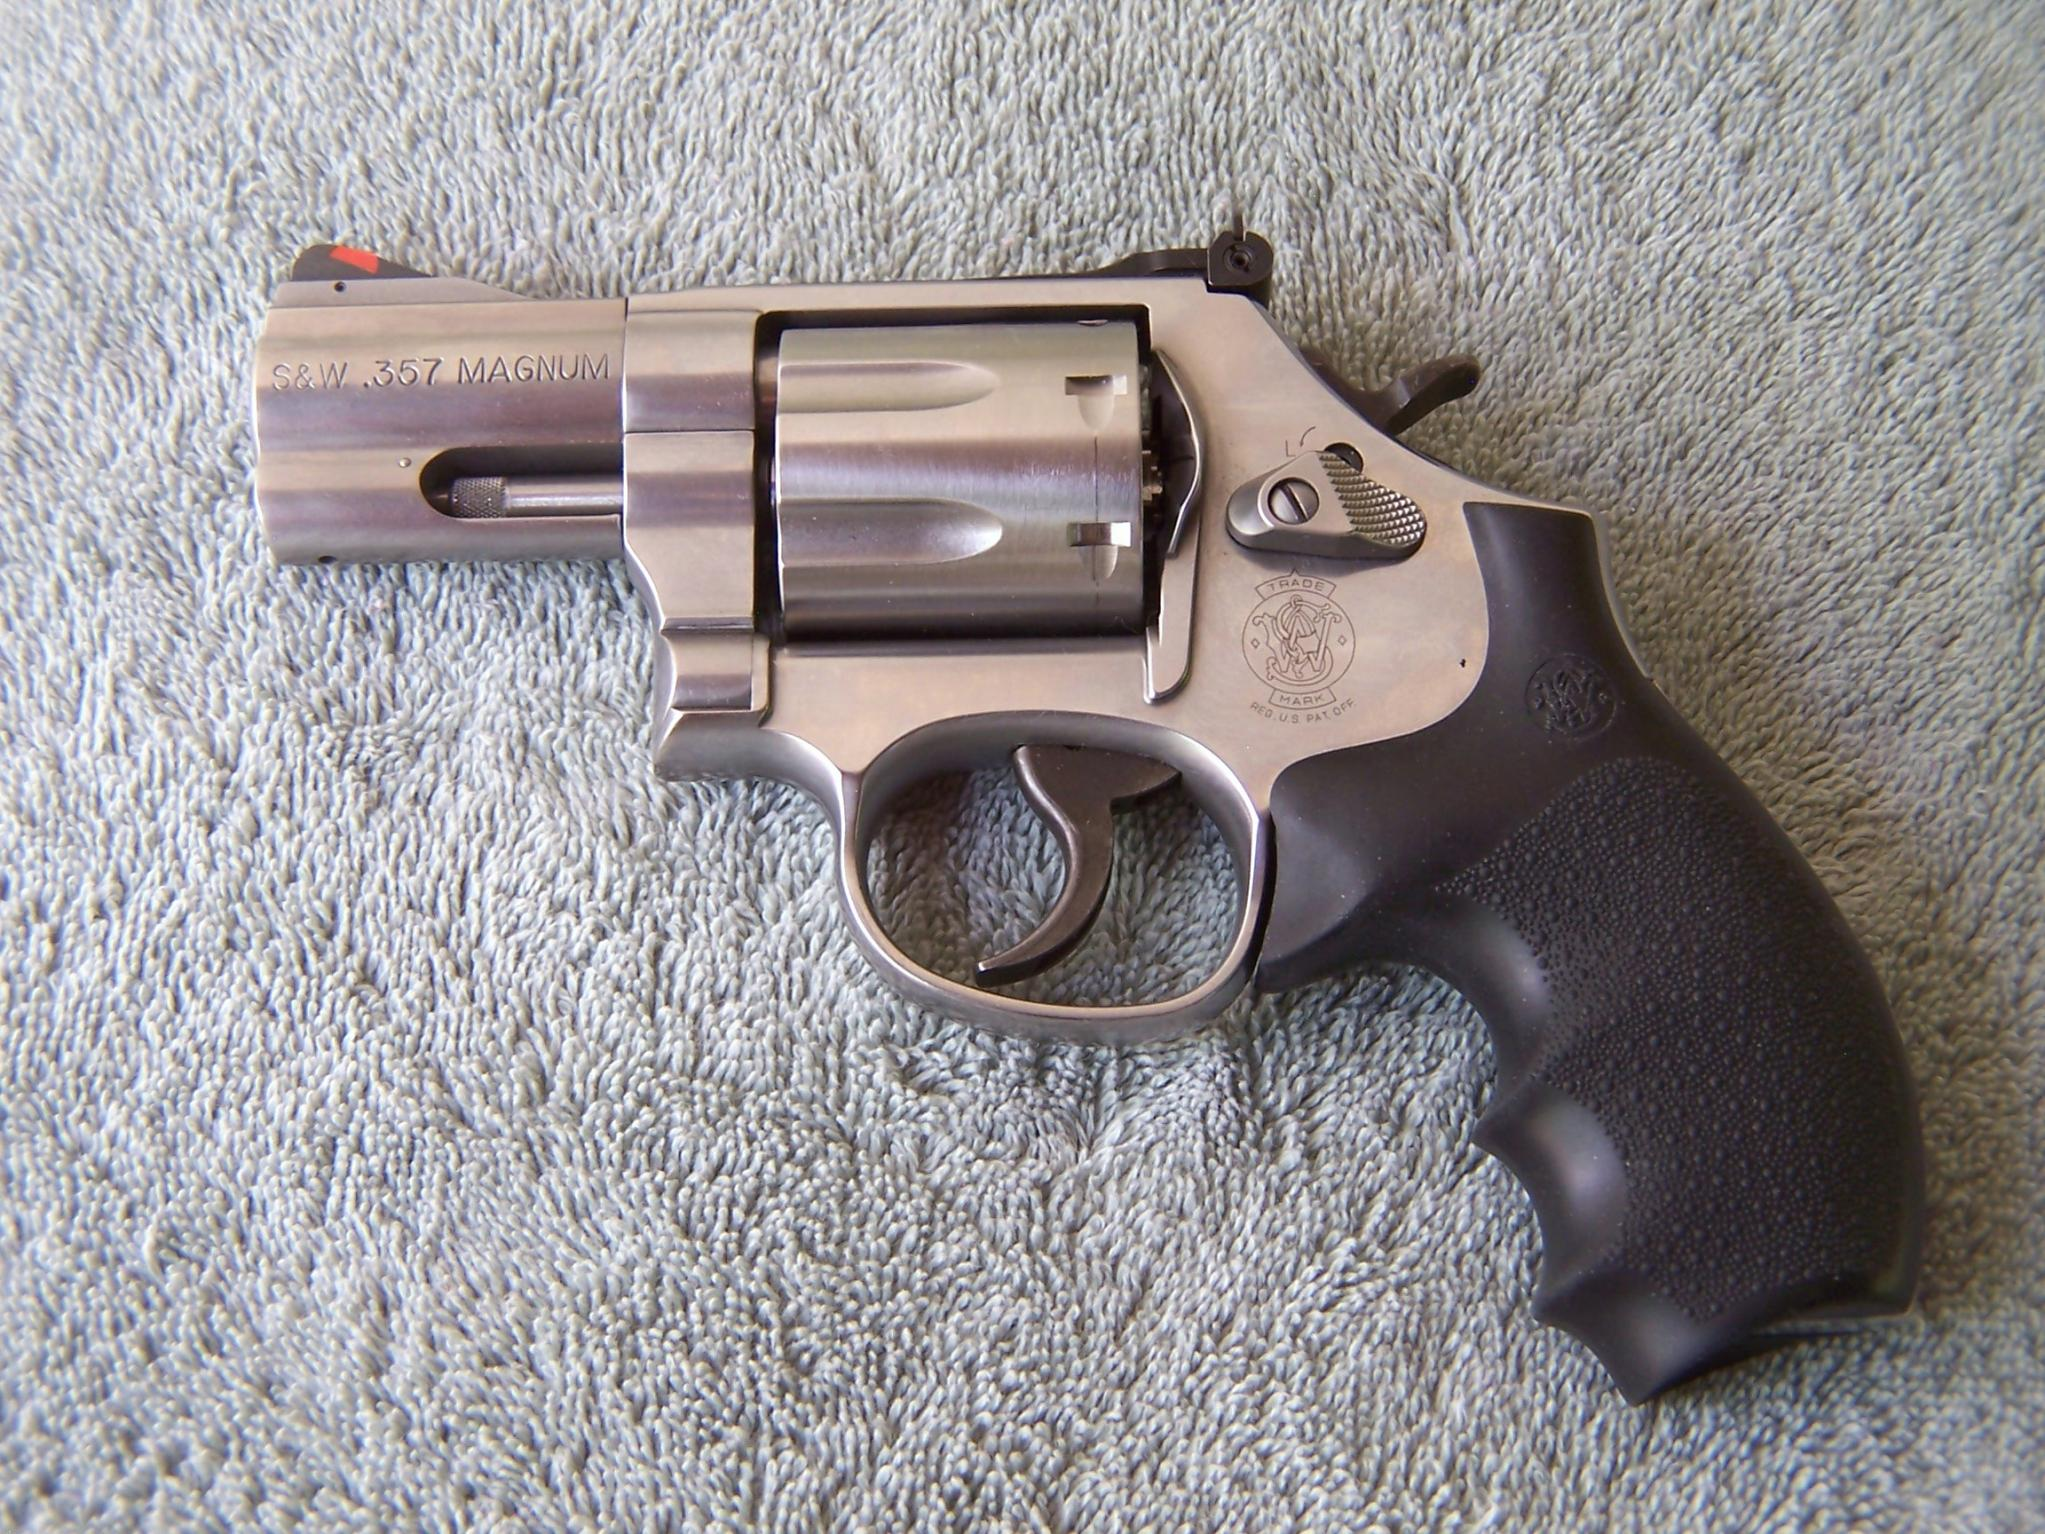 Carry Revolver-daz0871.jpg